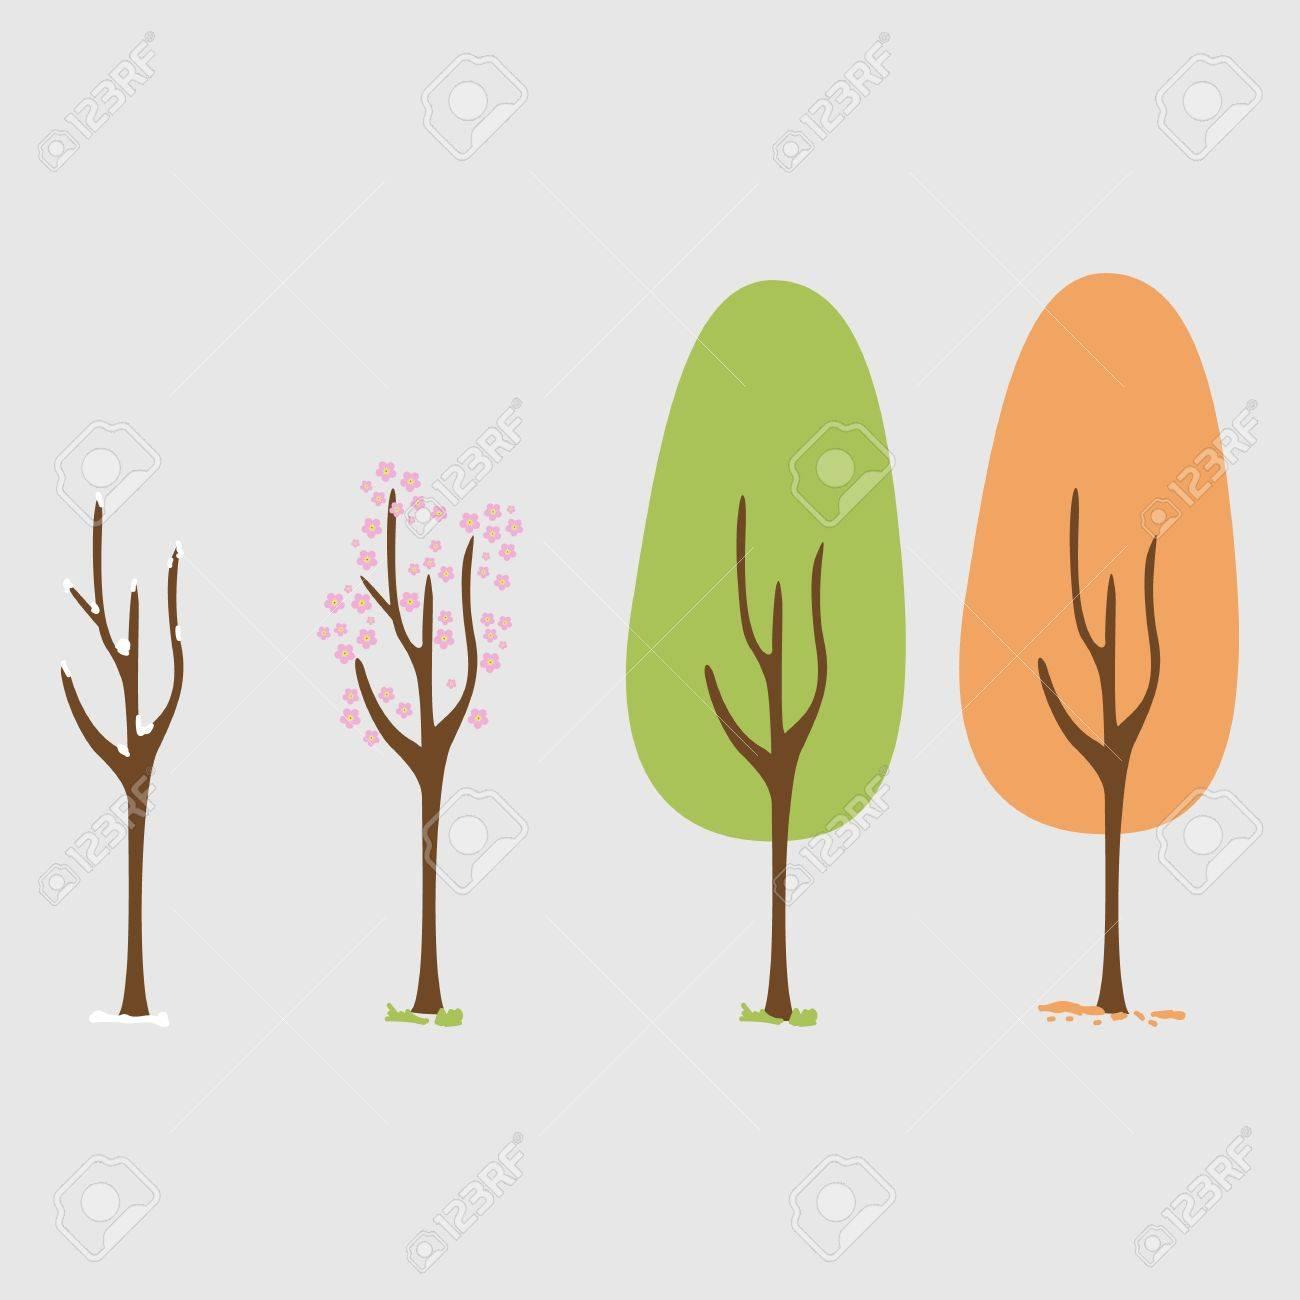 Four Seasons Spring Summer Autumn Winter Art Tree Tree